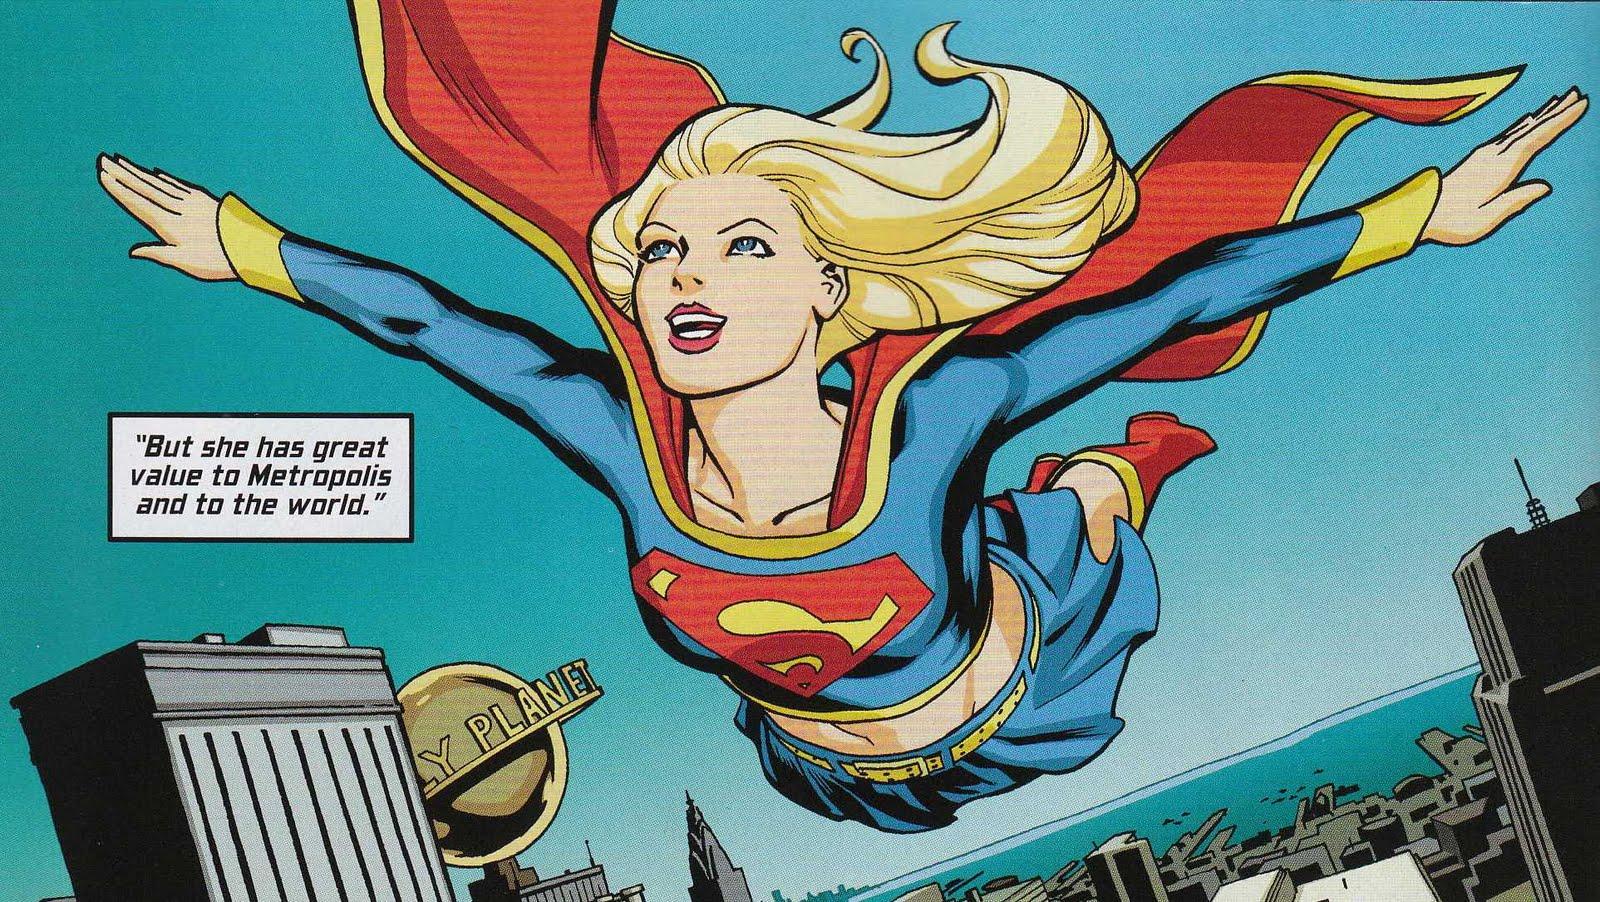 Supergirl comics images 23